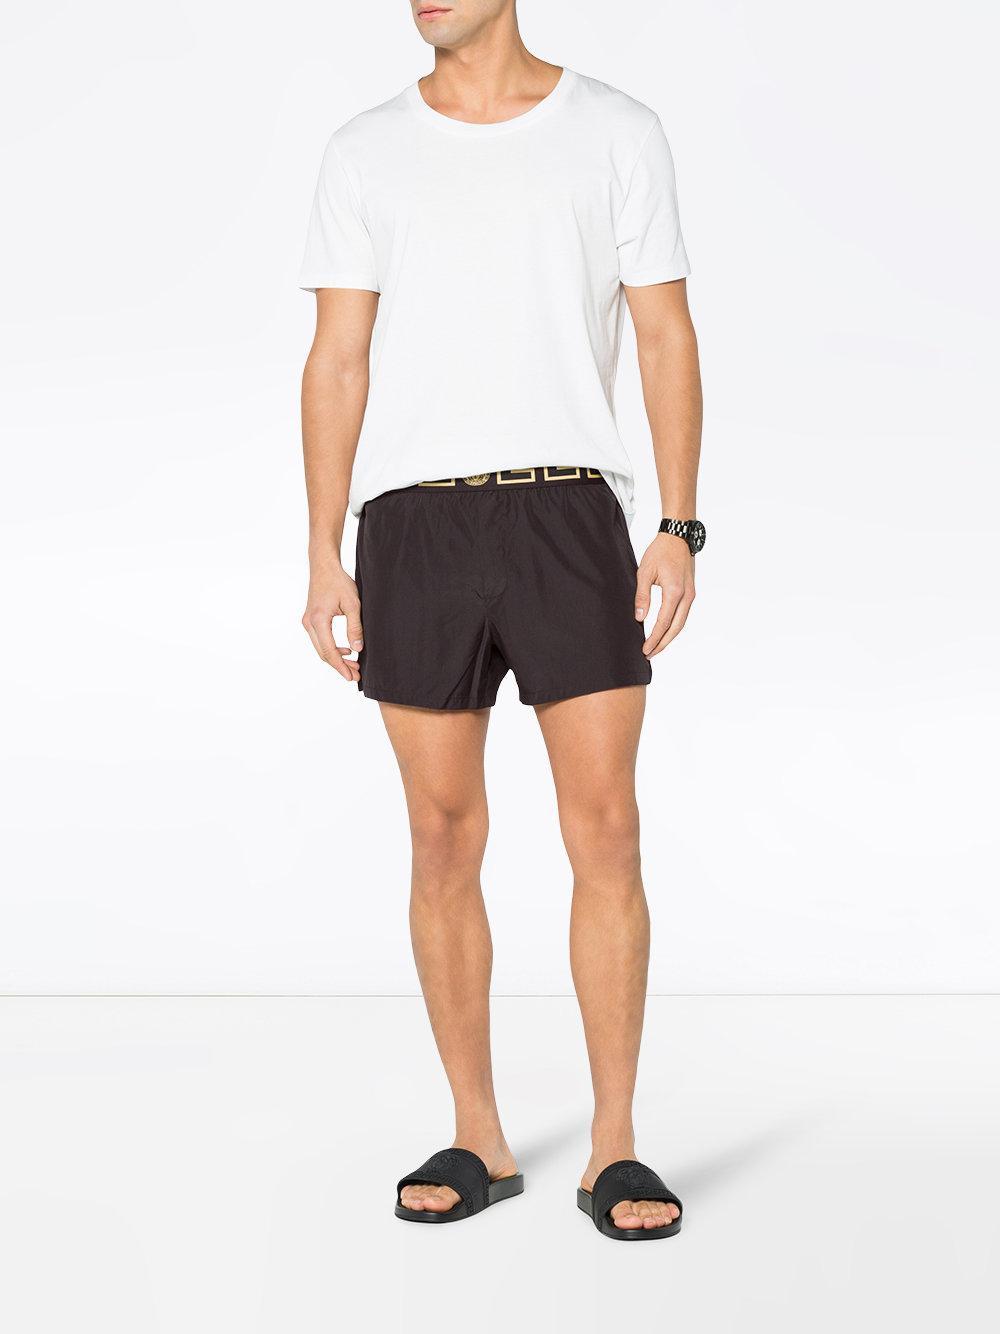 0470e0a2355e9 Versace Medusa Swim Shorts in Black for Men - Save 41% - Lyst